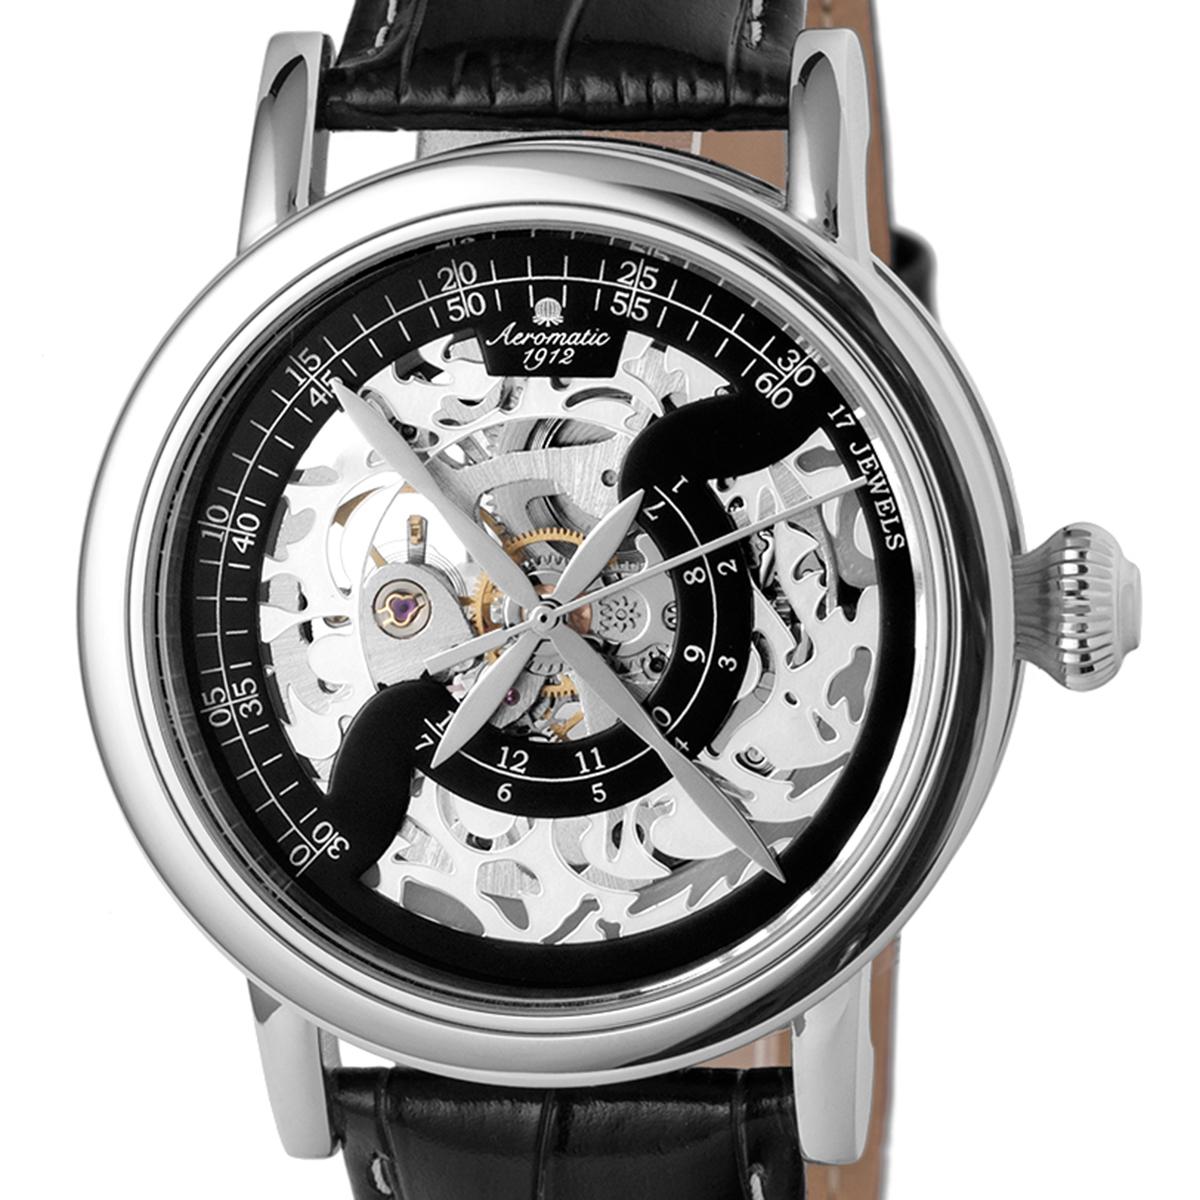 Aeromatic1912 エアロマティック1912 手巻き 腕時計 [A1410] 並行輸入品